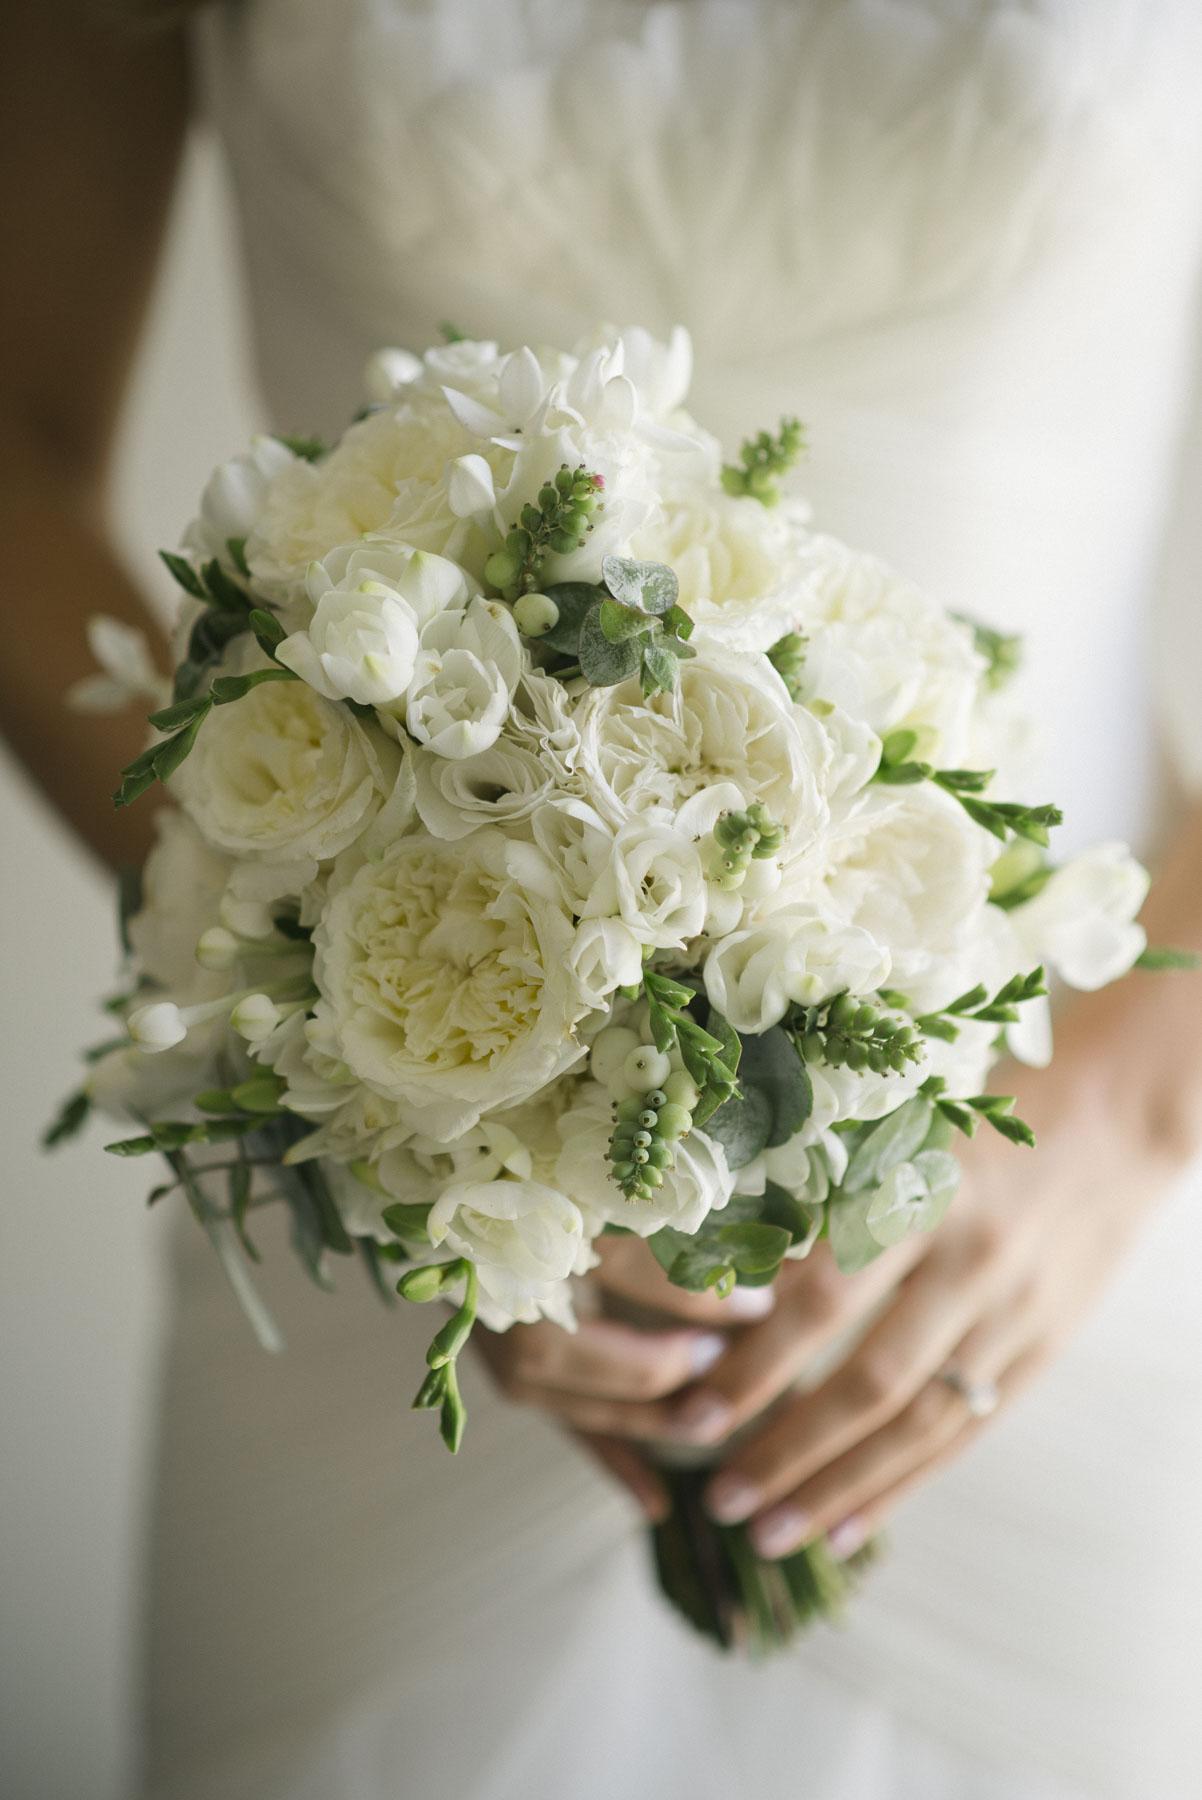 1501vand-117alan_moyle_wedding_portrait_brighton_bayside_werribee_estate_mansion_zoo_rustic_styled_garden_mansion_candid_documentry_victoria_whitelaw.jpg